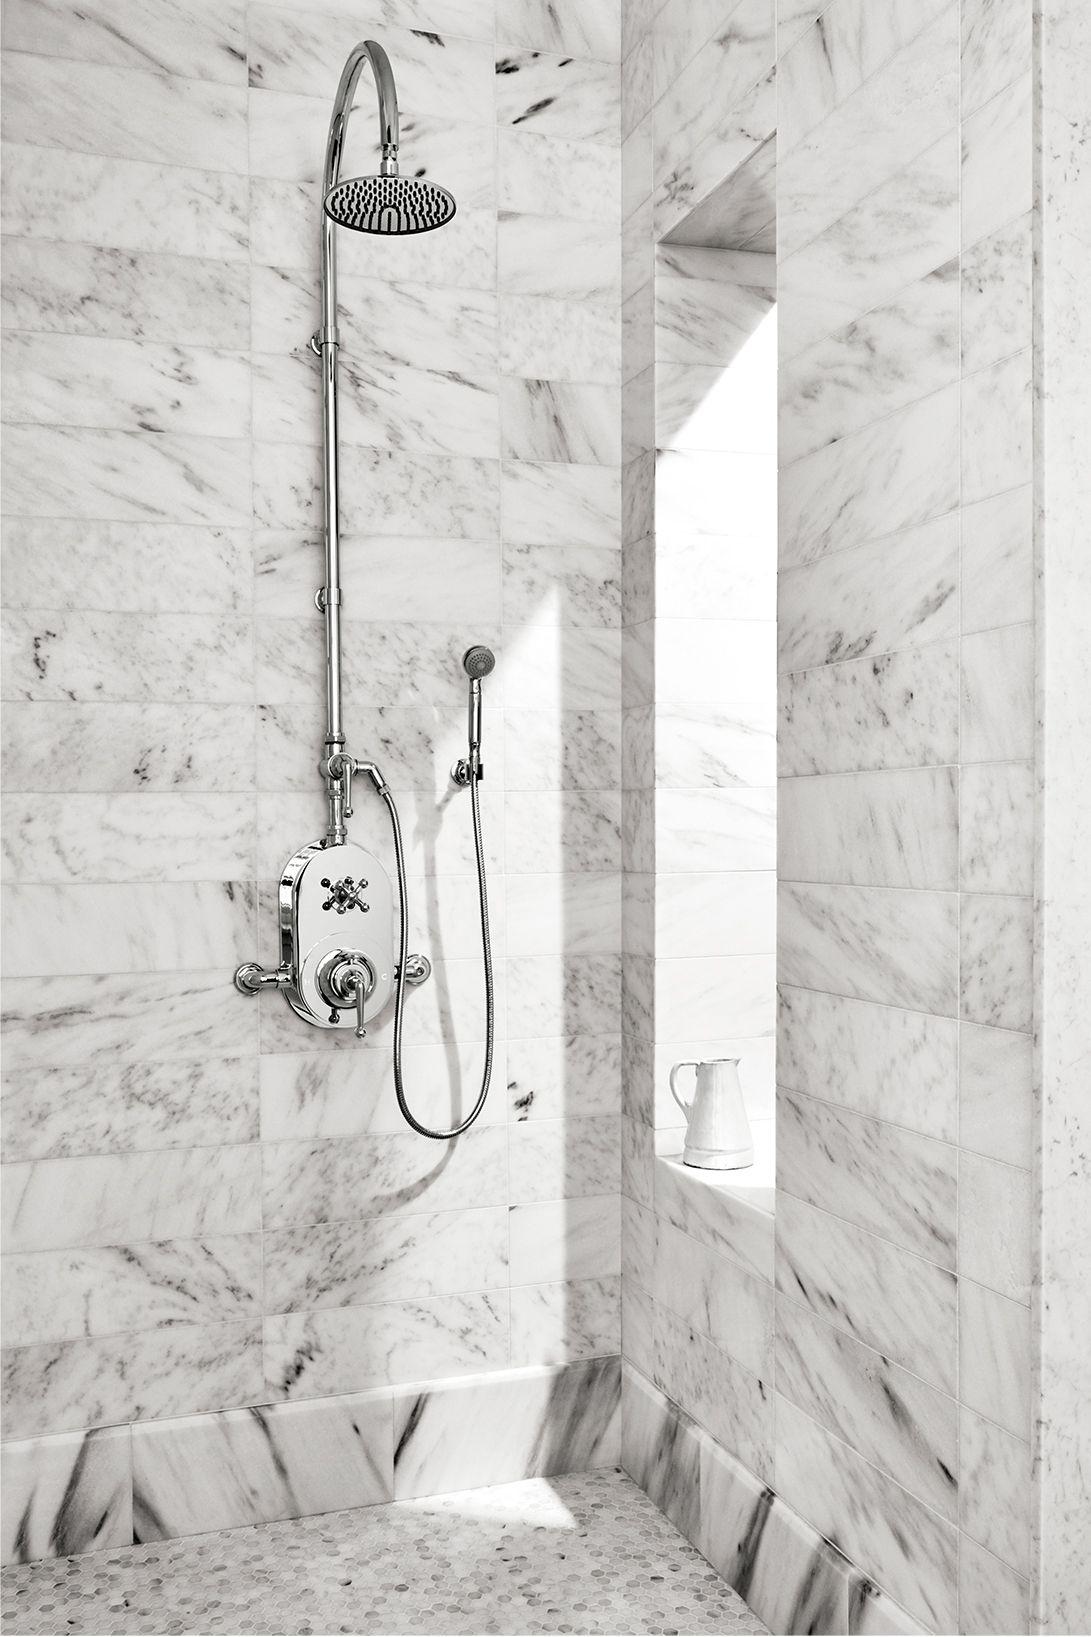 Keystone Stowe Base 6 X 18 Shower Systems Hand Shower Bathroom Sink Decor